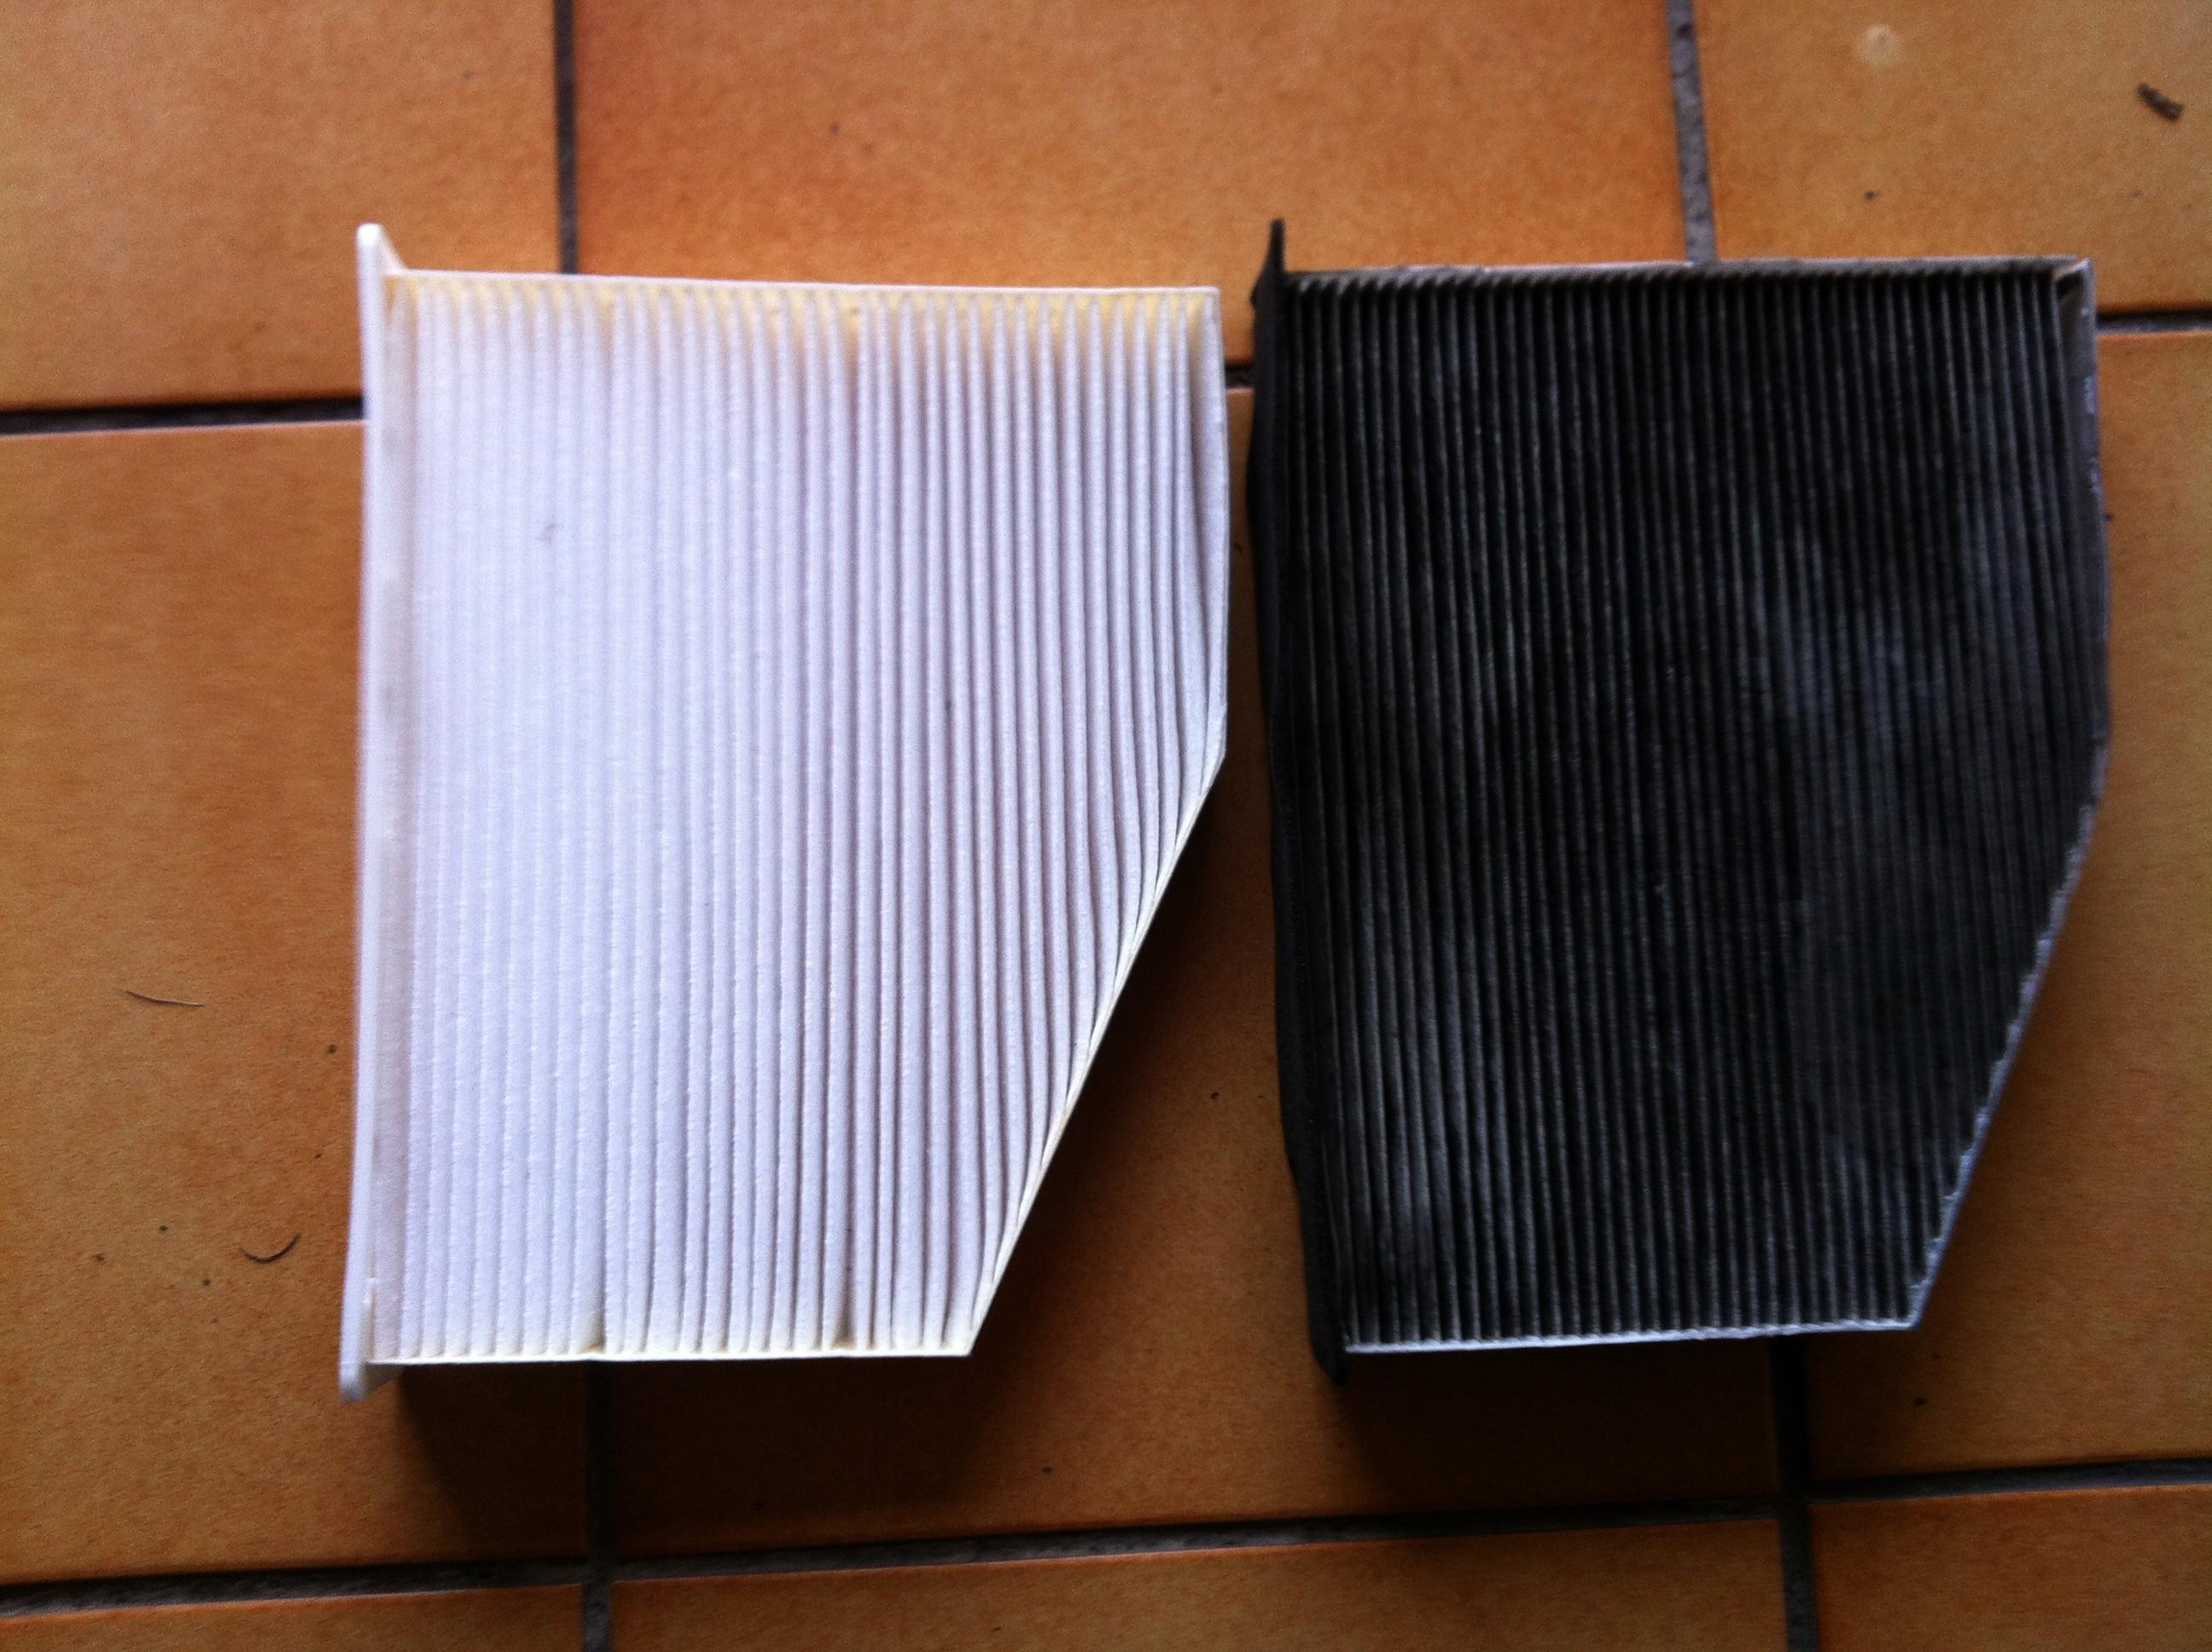 loic077 mon a3 sportback mise a jour page 1 garages des a3 1 6 1 9 tdi 105 page 3. Black Bedroom Furniture Sets. Home Design Ideas